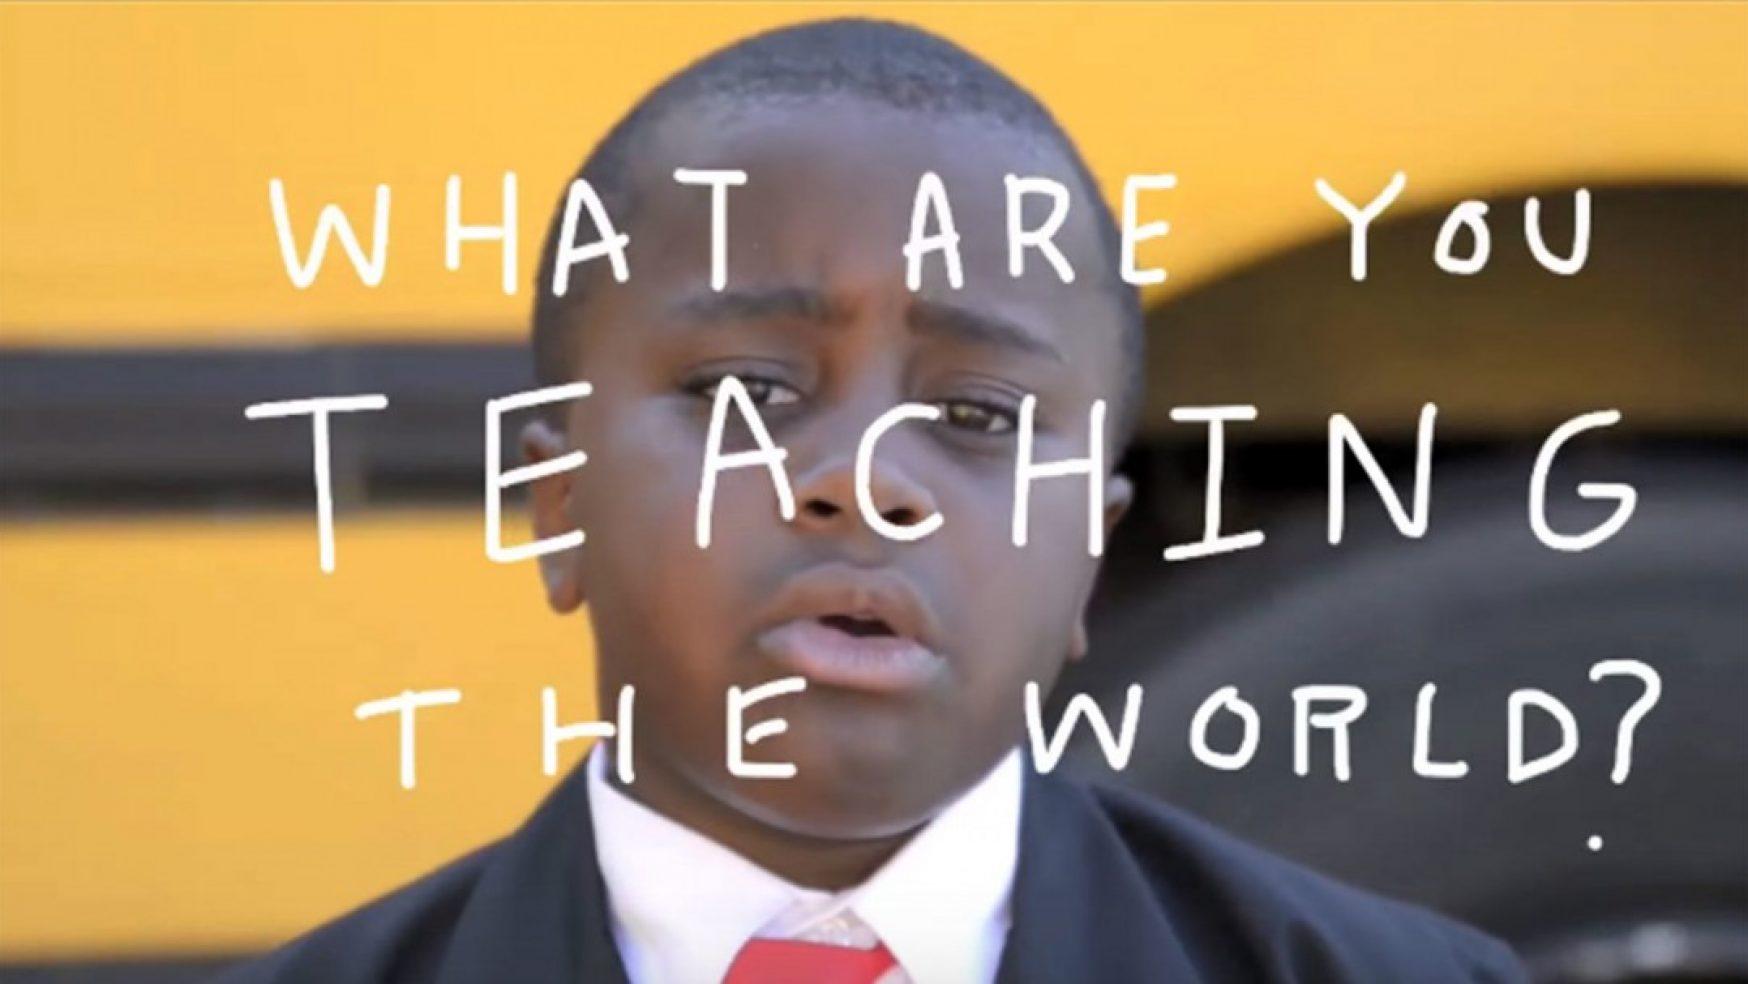 A PEP TALK BY KID PRESIDENT